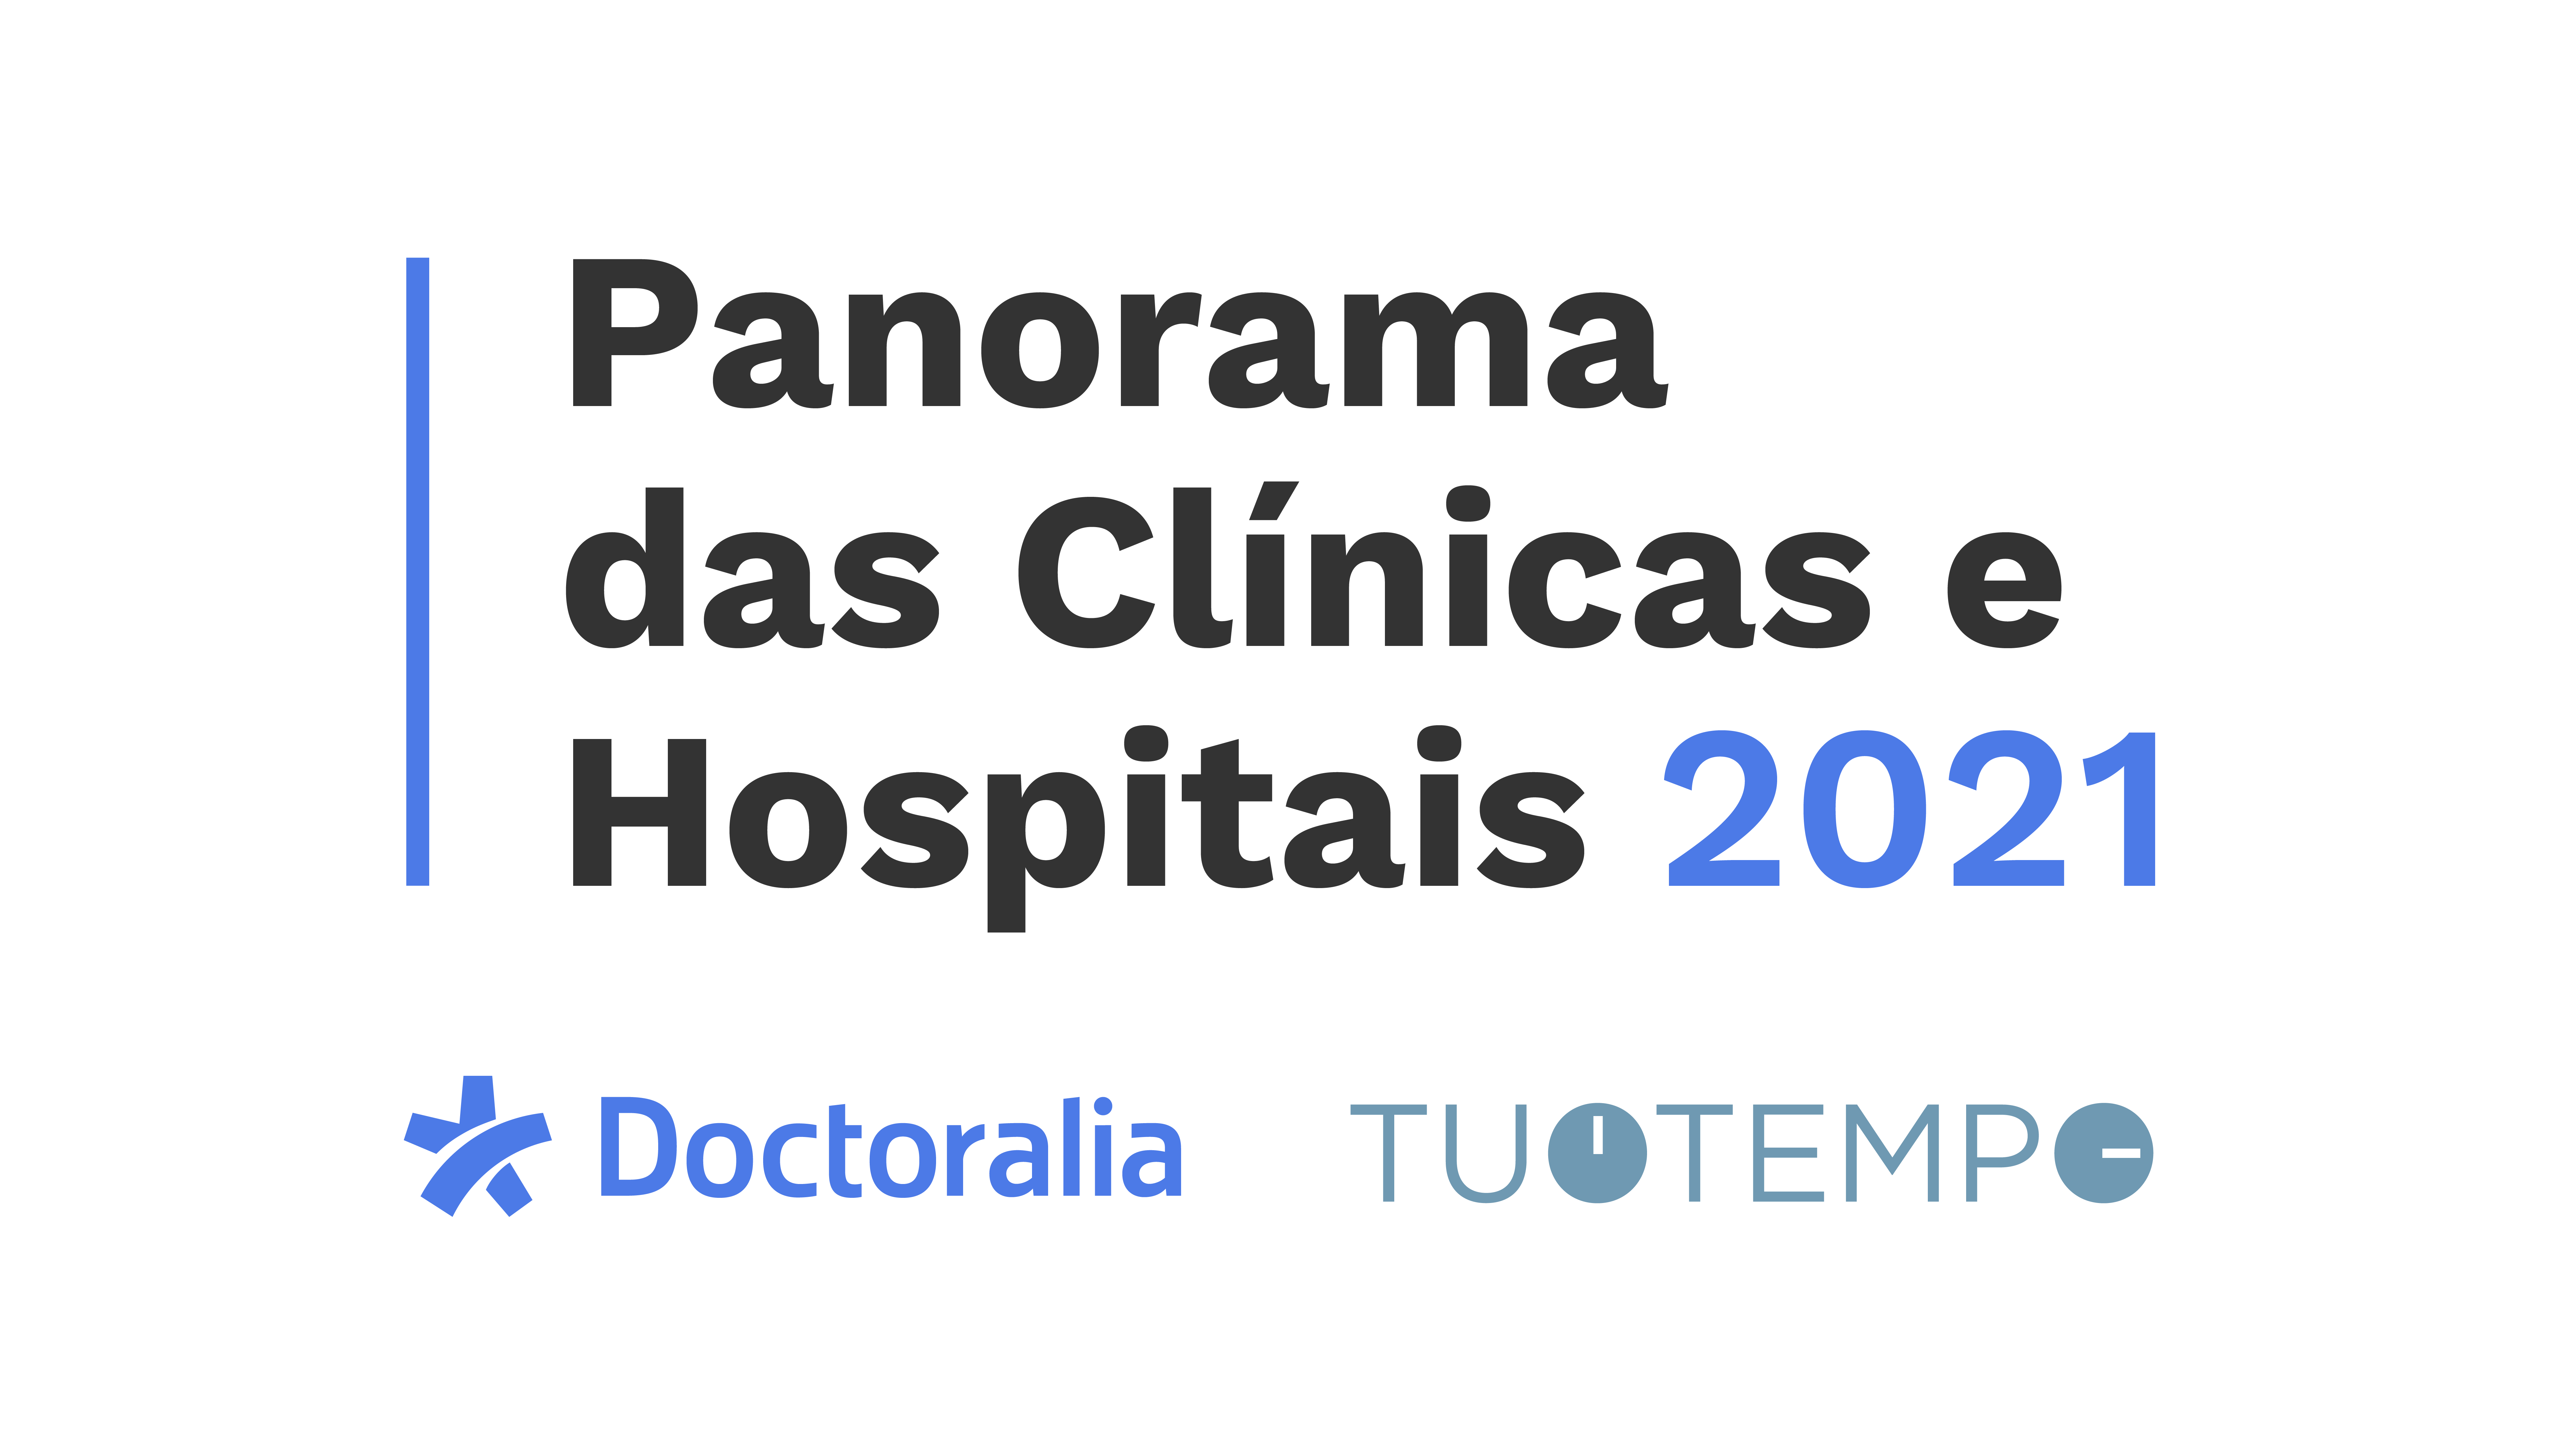 Panorama das clínicas e hospitais 2021 - Doctoralia + TuoTempo